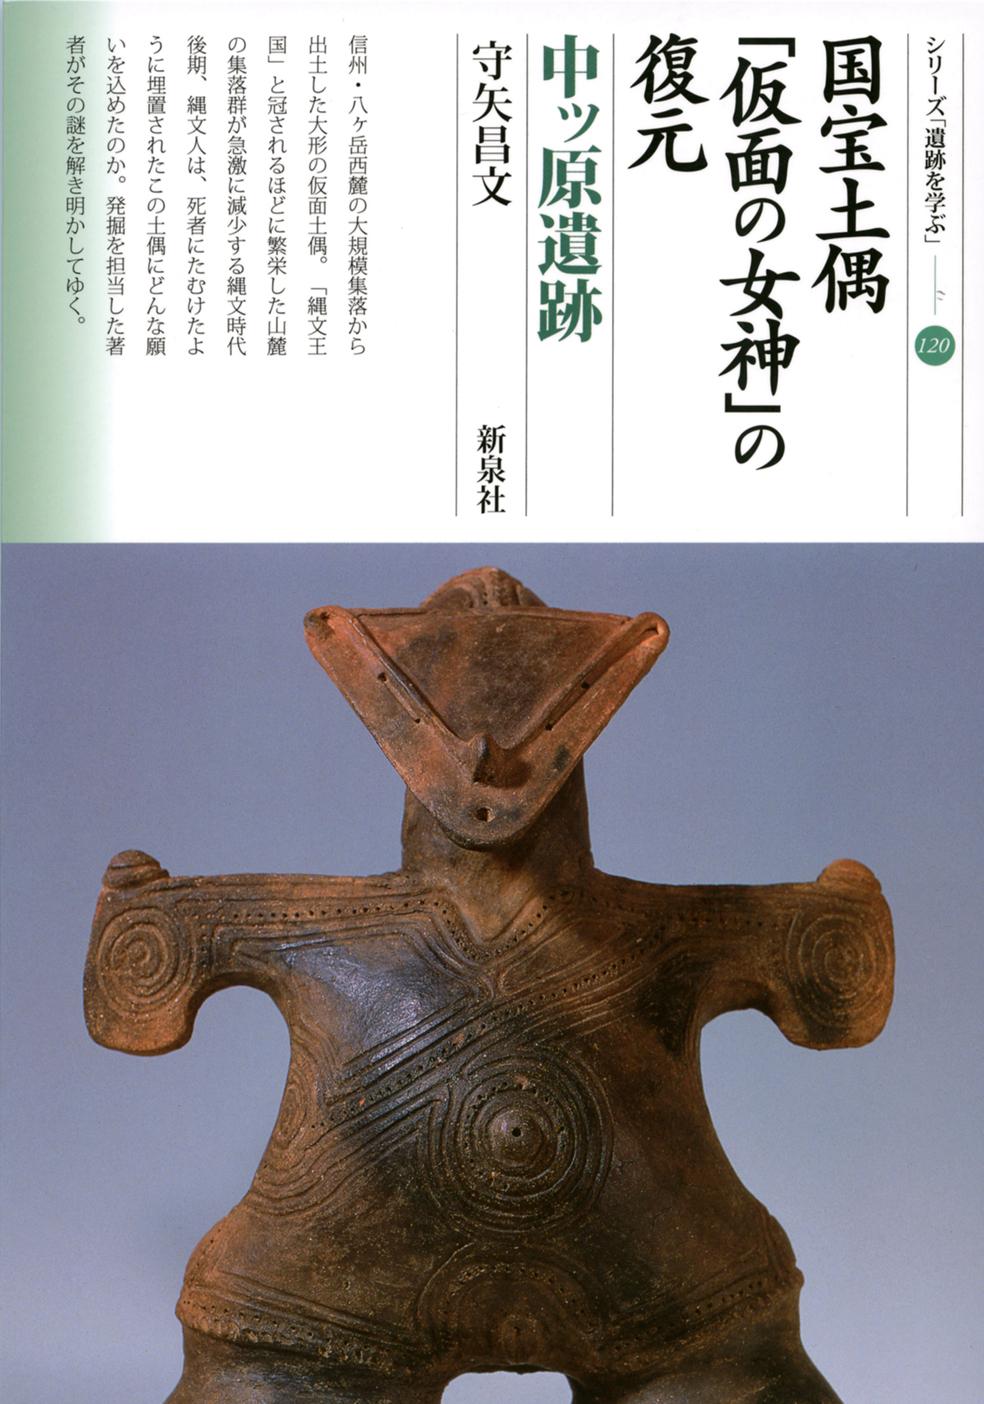 国宝土偶「仮面の女神」の復元・中ッ原遺跡